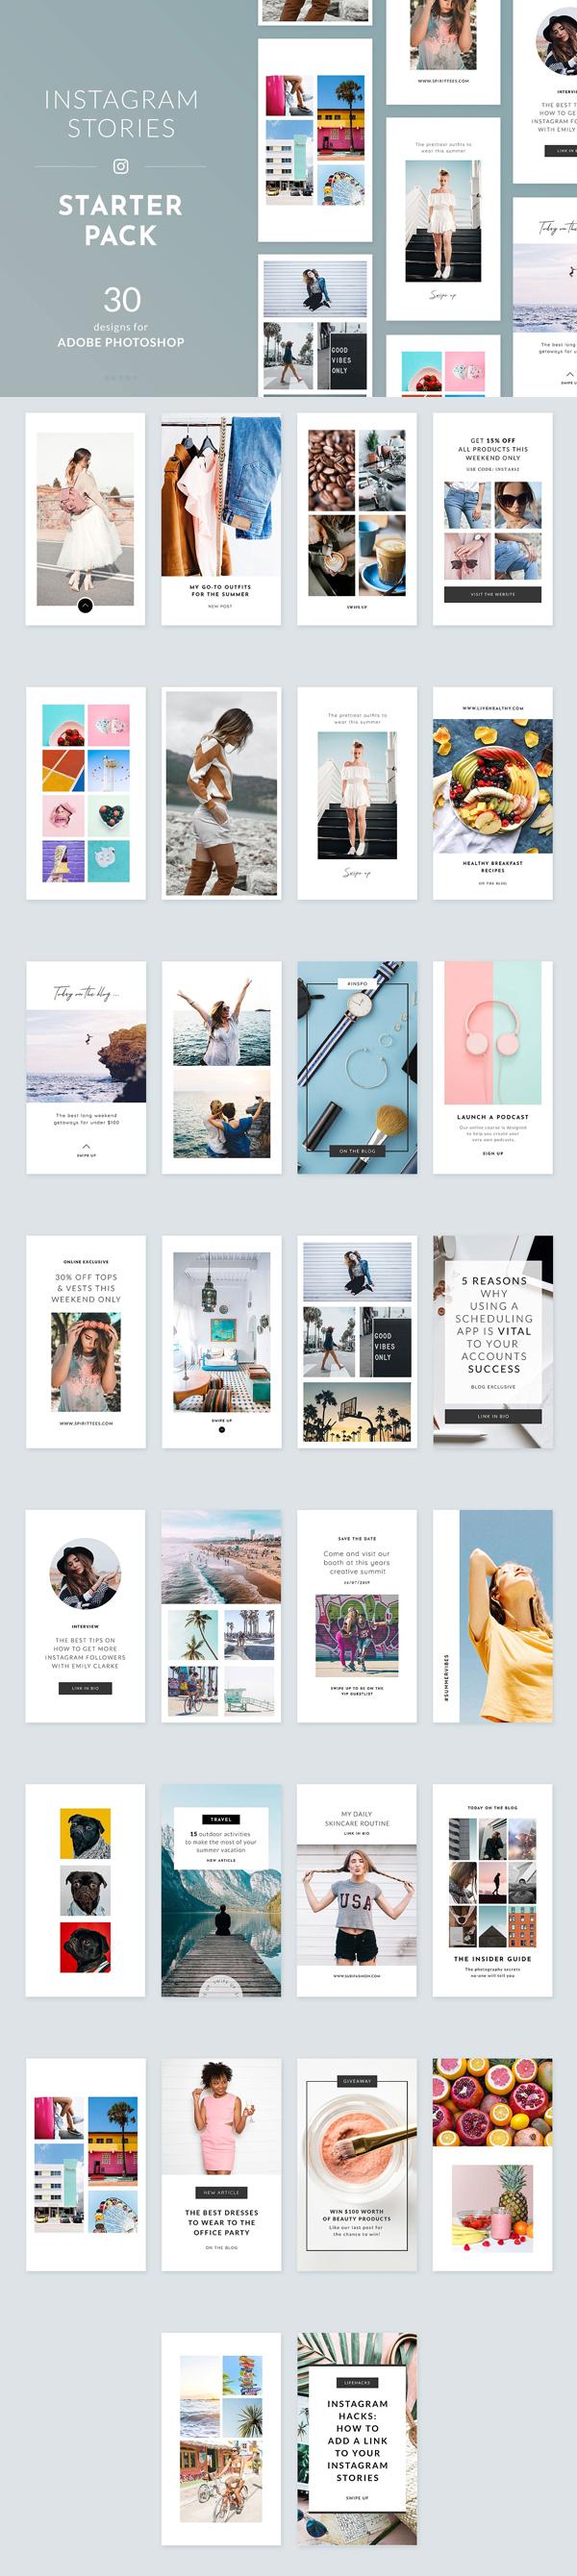 Free Instagram Stories Starter Pack